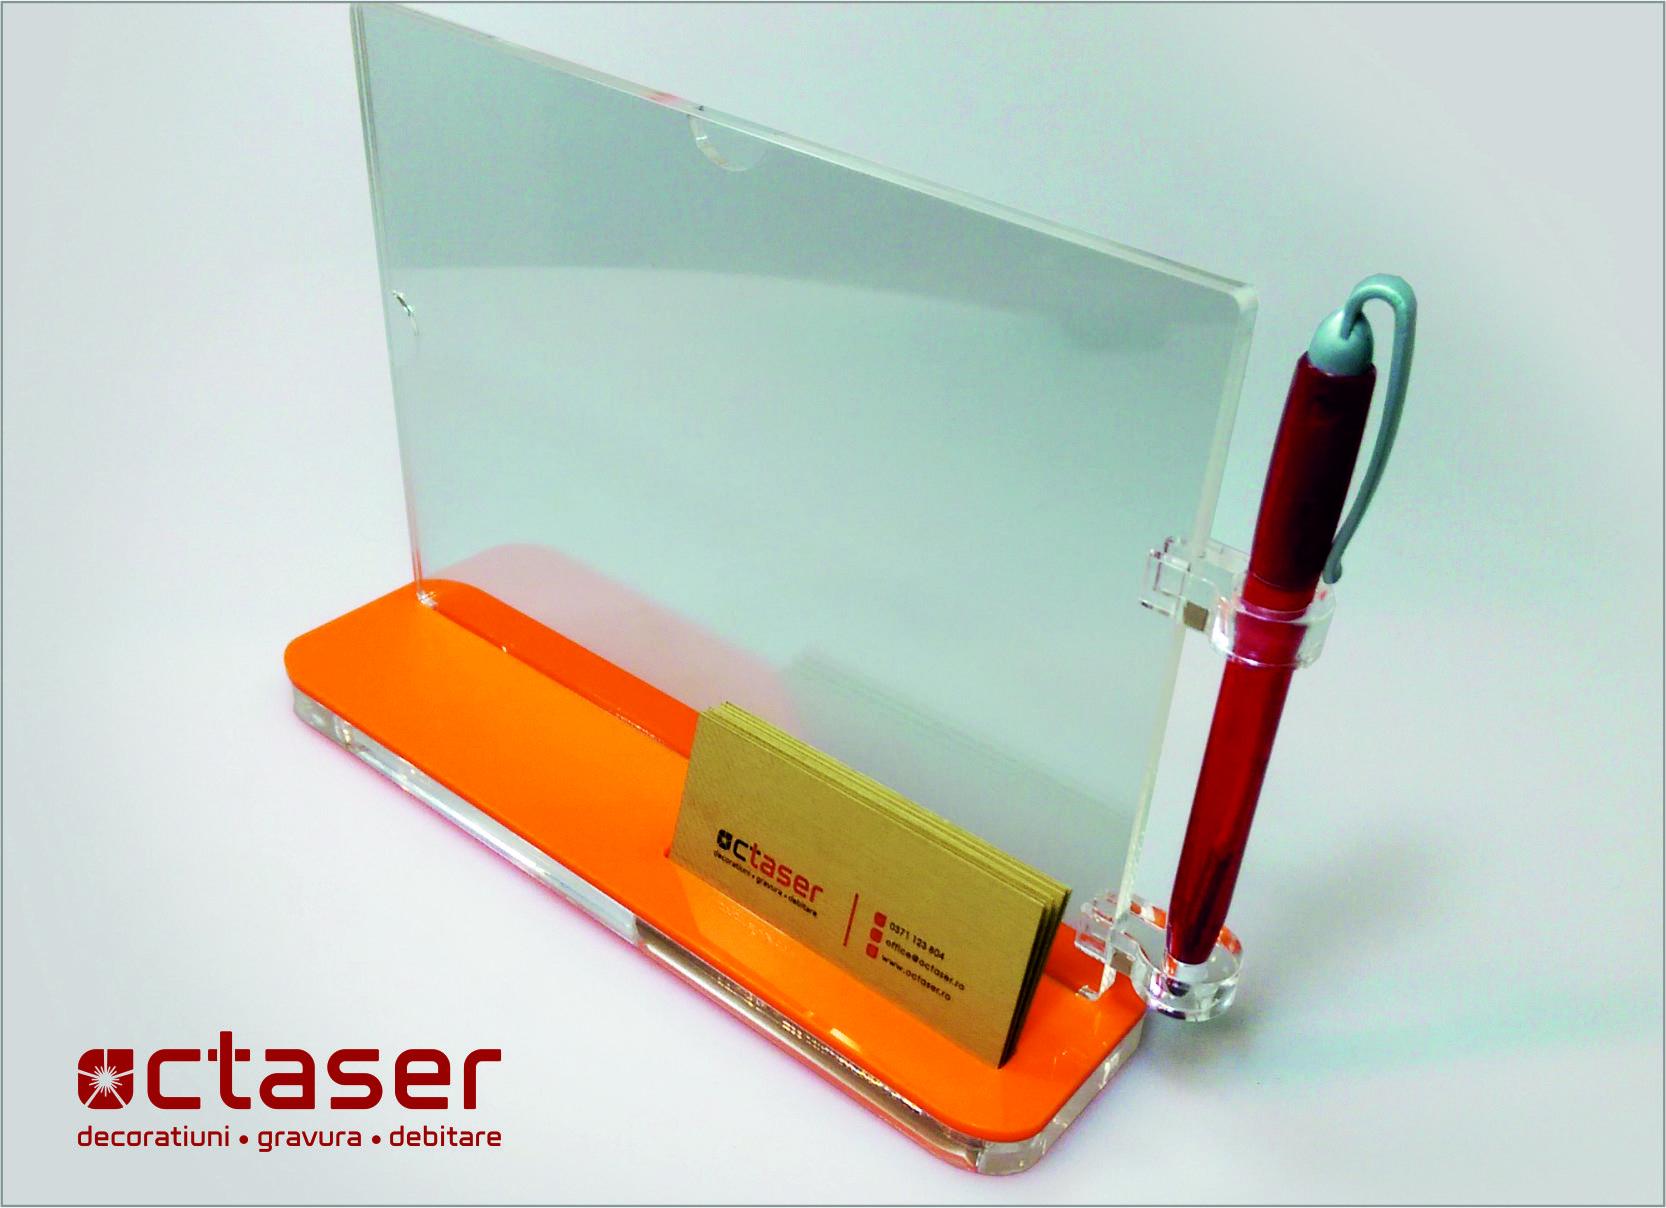 suport plexiglas display plexiglas debitare laser  Suport plexiglas / Display plexiglas realizat prin debitare laser suport plexiglas display plexiglas debitare laser